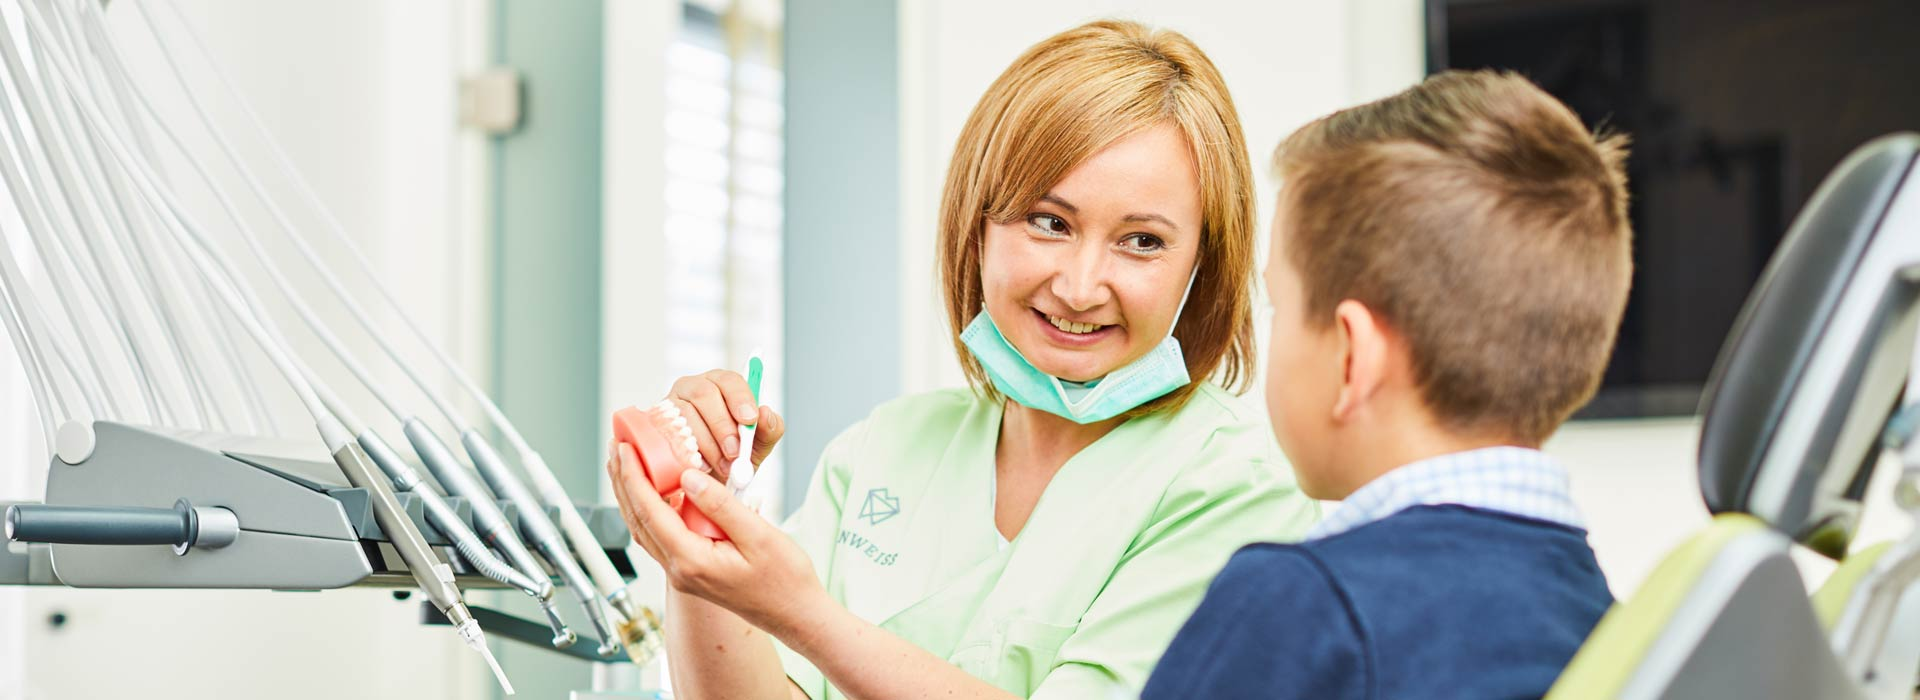 ZAHNWEISS – Praxis für moderne Zahnmedizin - Prophylaxe 1